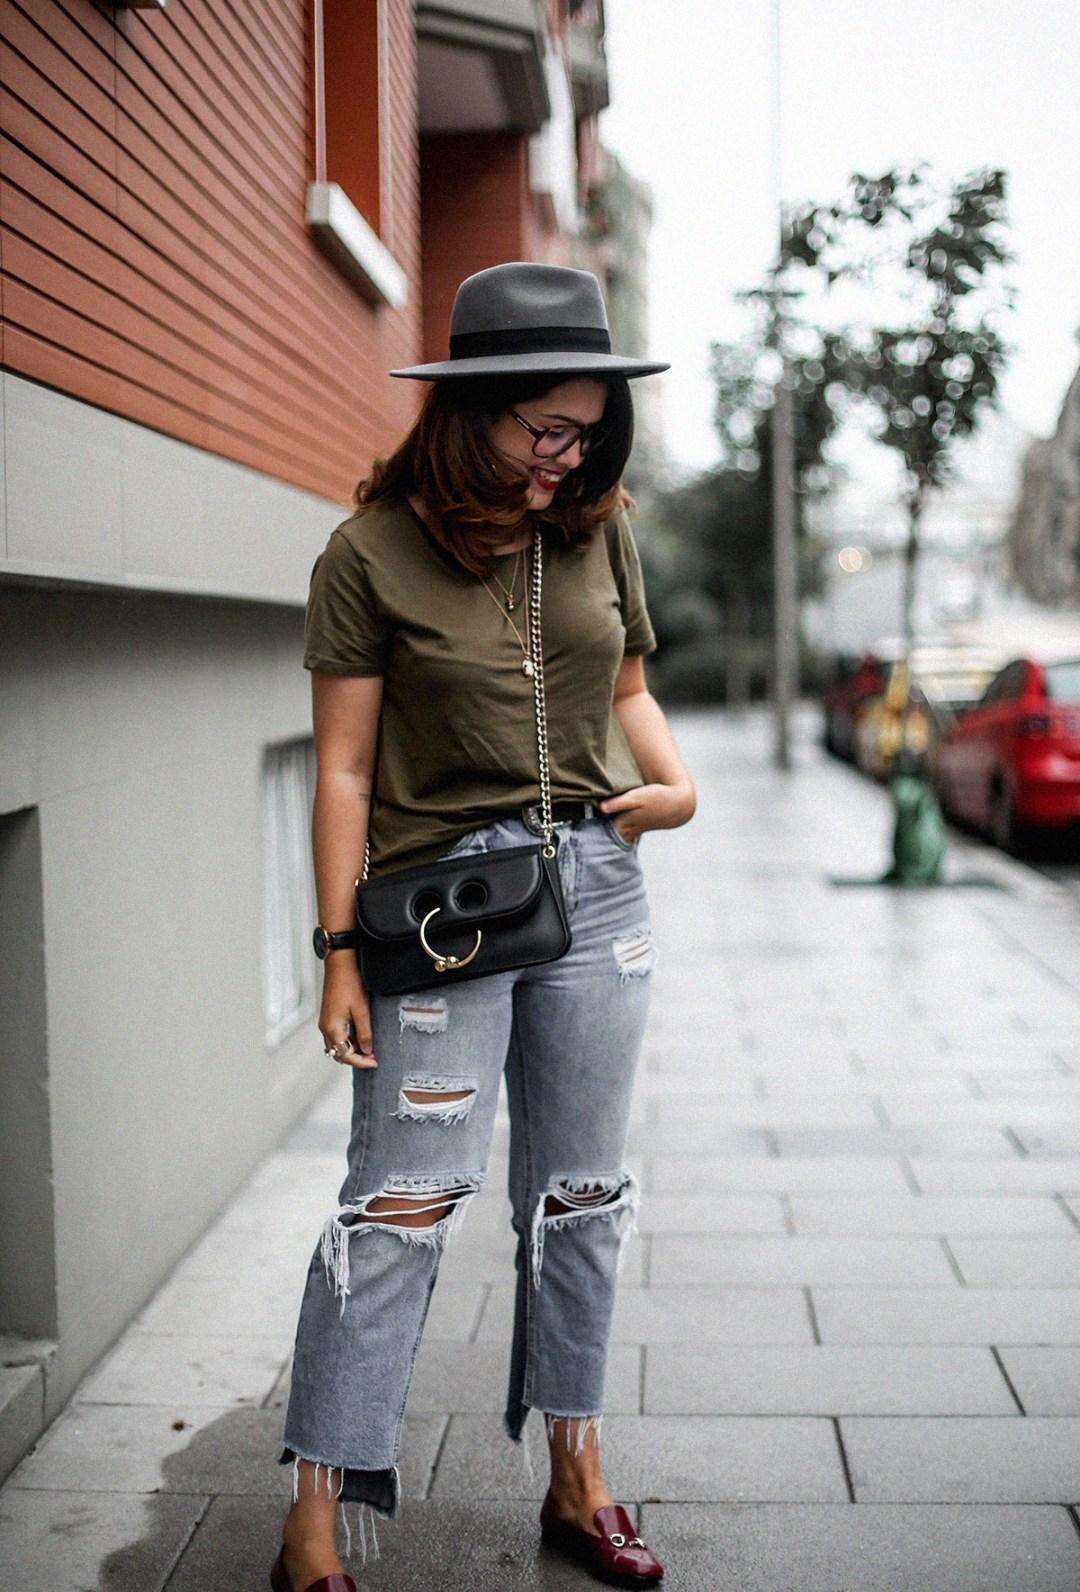 camiseta-verde-militar-basica-look-gucci-horsebit-mocasines-streetstyle15